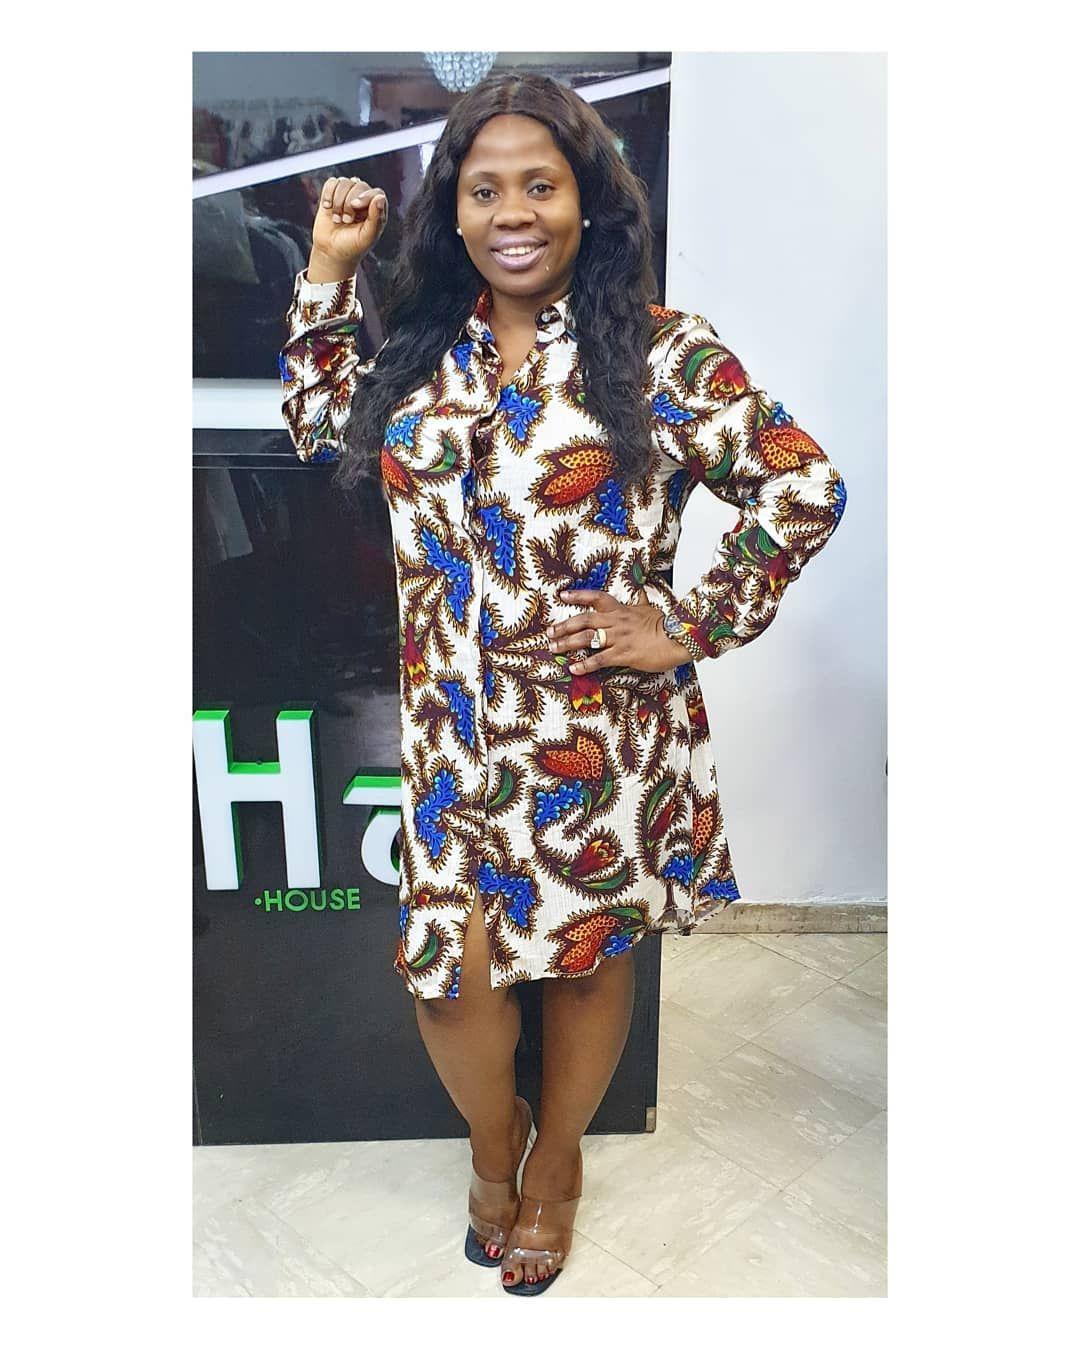 Colorful shirt dress  Size 12-18.. ..10,000NAIRA  Our physical store is opened and ready to serve you better   9am - 6pm  Mondays - Saturdays  New arrival in store @HOUSEOFKERON   WhatsApp 08097485302  Slide  into  our DM   #sale #sale #Hokwoman #skirt #bellanaijaweddings  #tundeednut #naija #couplegoals #coro#naijafashion#houseofkeron #Hokwoman #VIRUS #Lagos #abuja #portharcourt #entrepreneur #enugu #owerri #asoebibella #onlineshop #bayelsa #abia #interiordesign #edo#ikejaboutiques